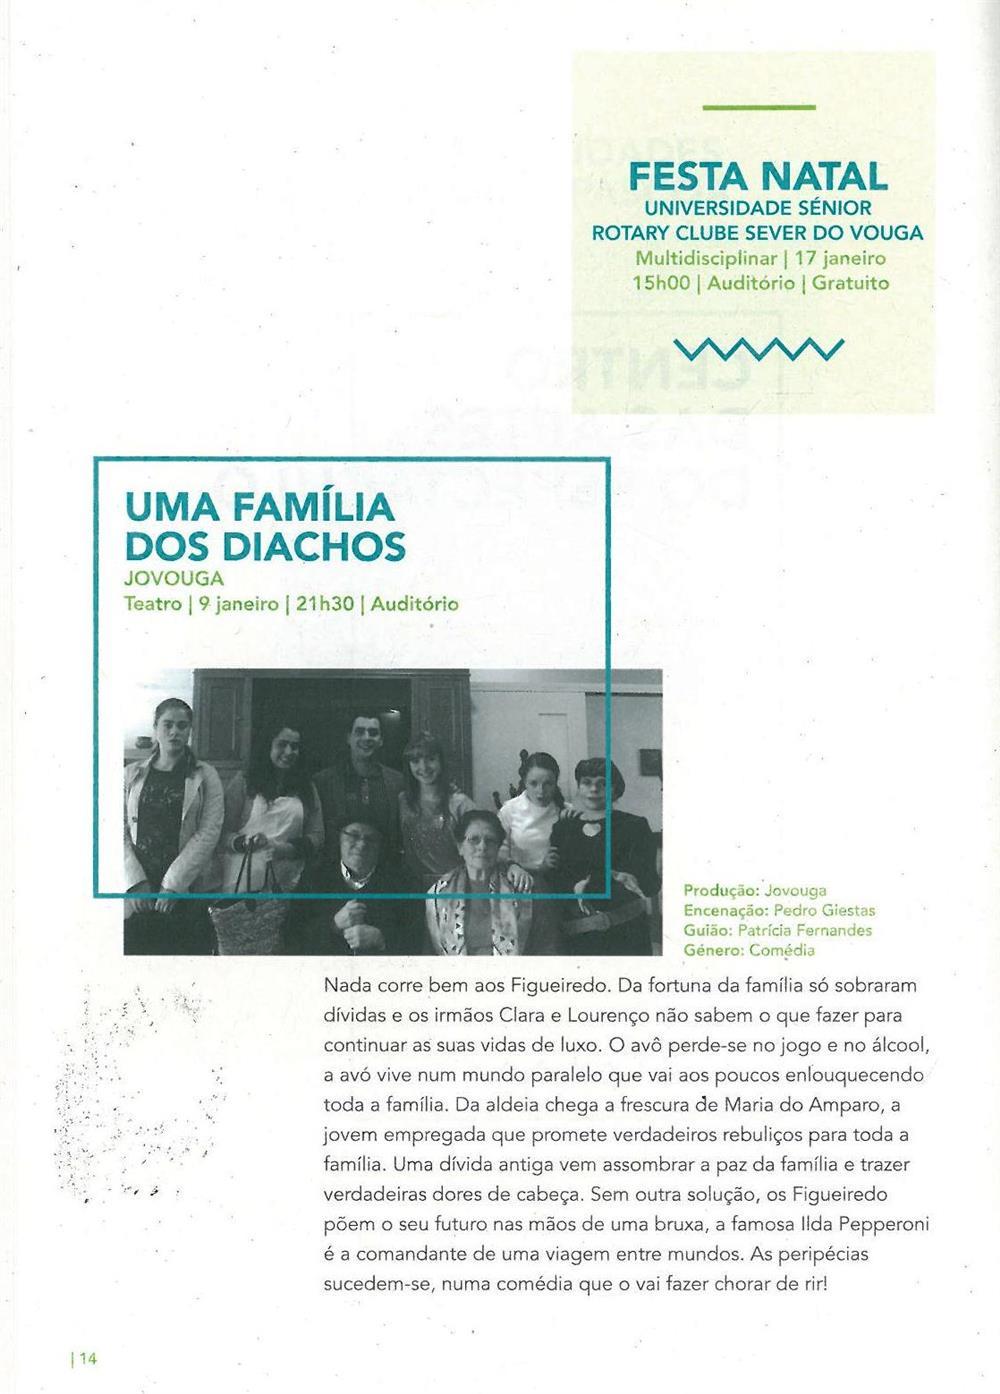 ACMSV-jan.,fev.,mar.'16-p.14-Festa Natal : Universidade Sénior : Rotary Clube Sever do Vouga.jpg